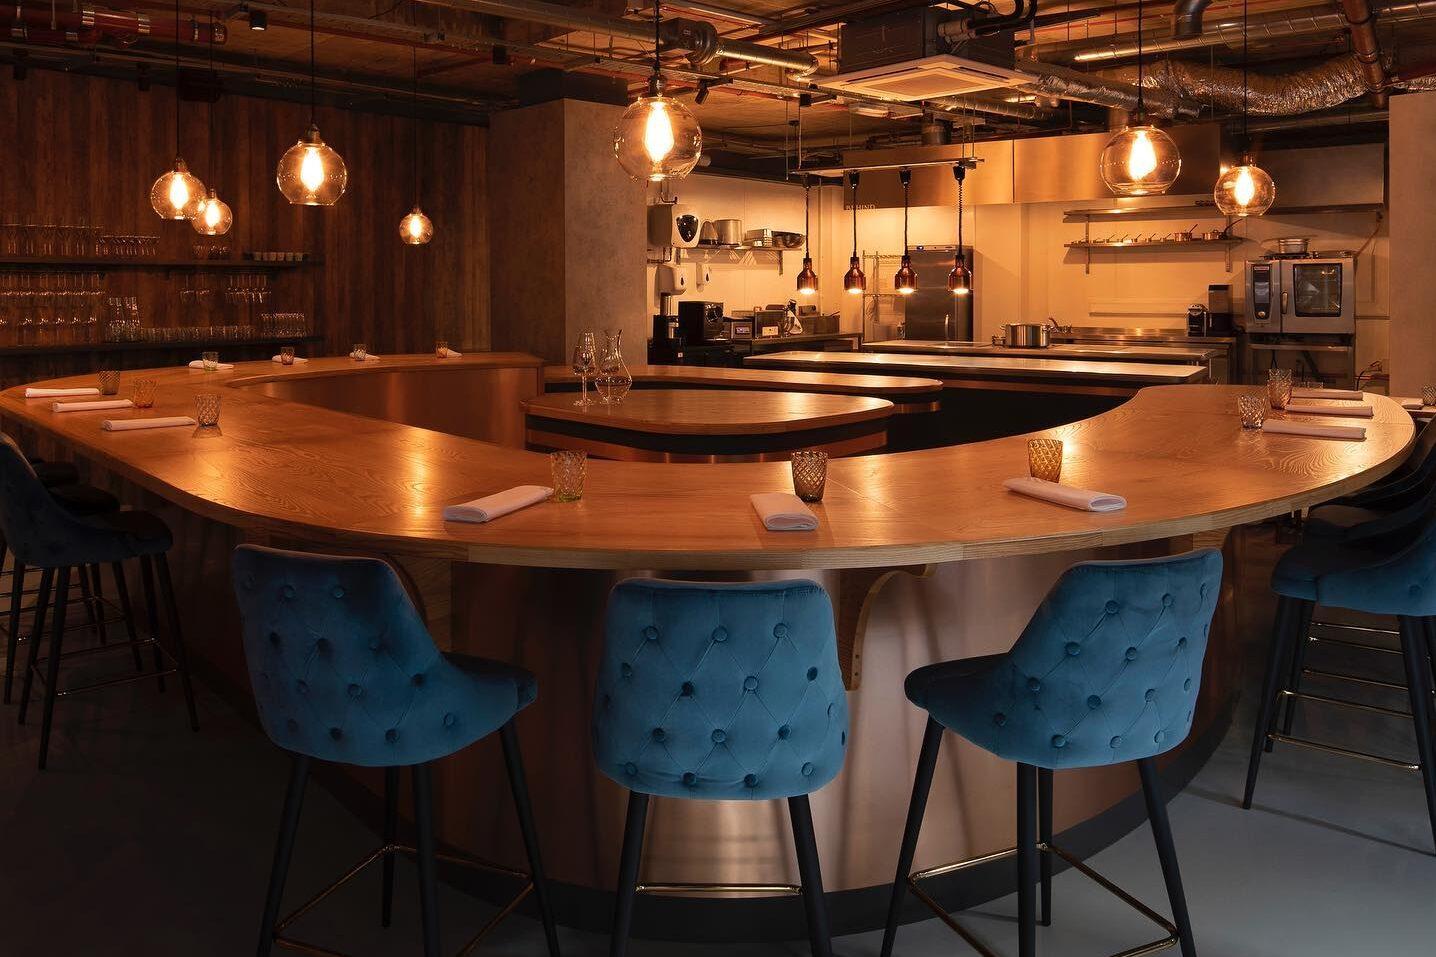 behind new michelin star restaurant london